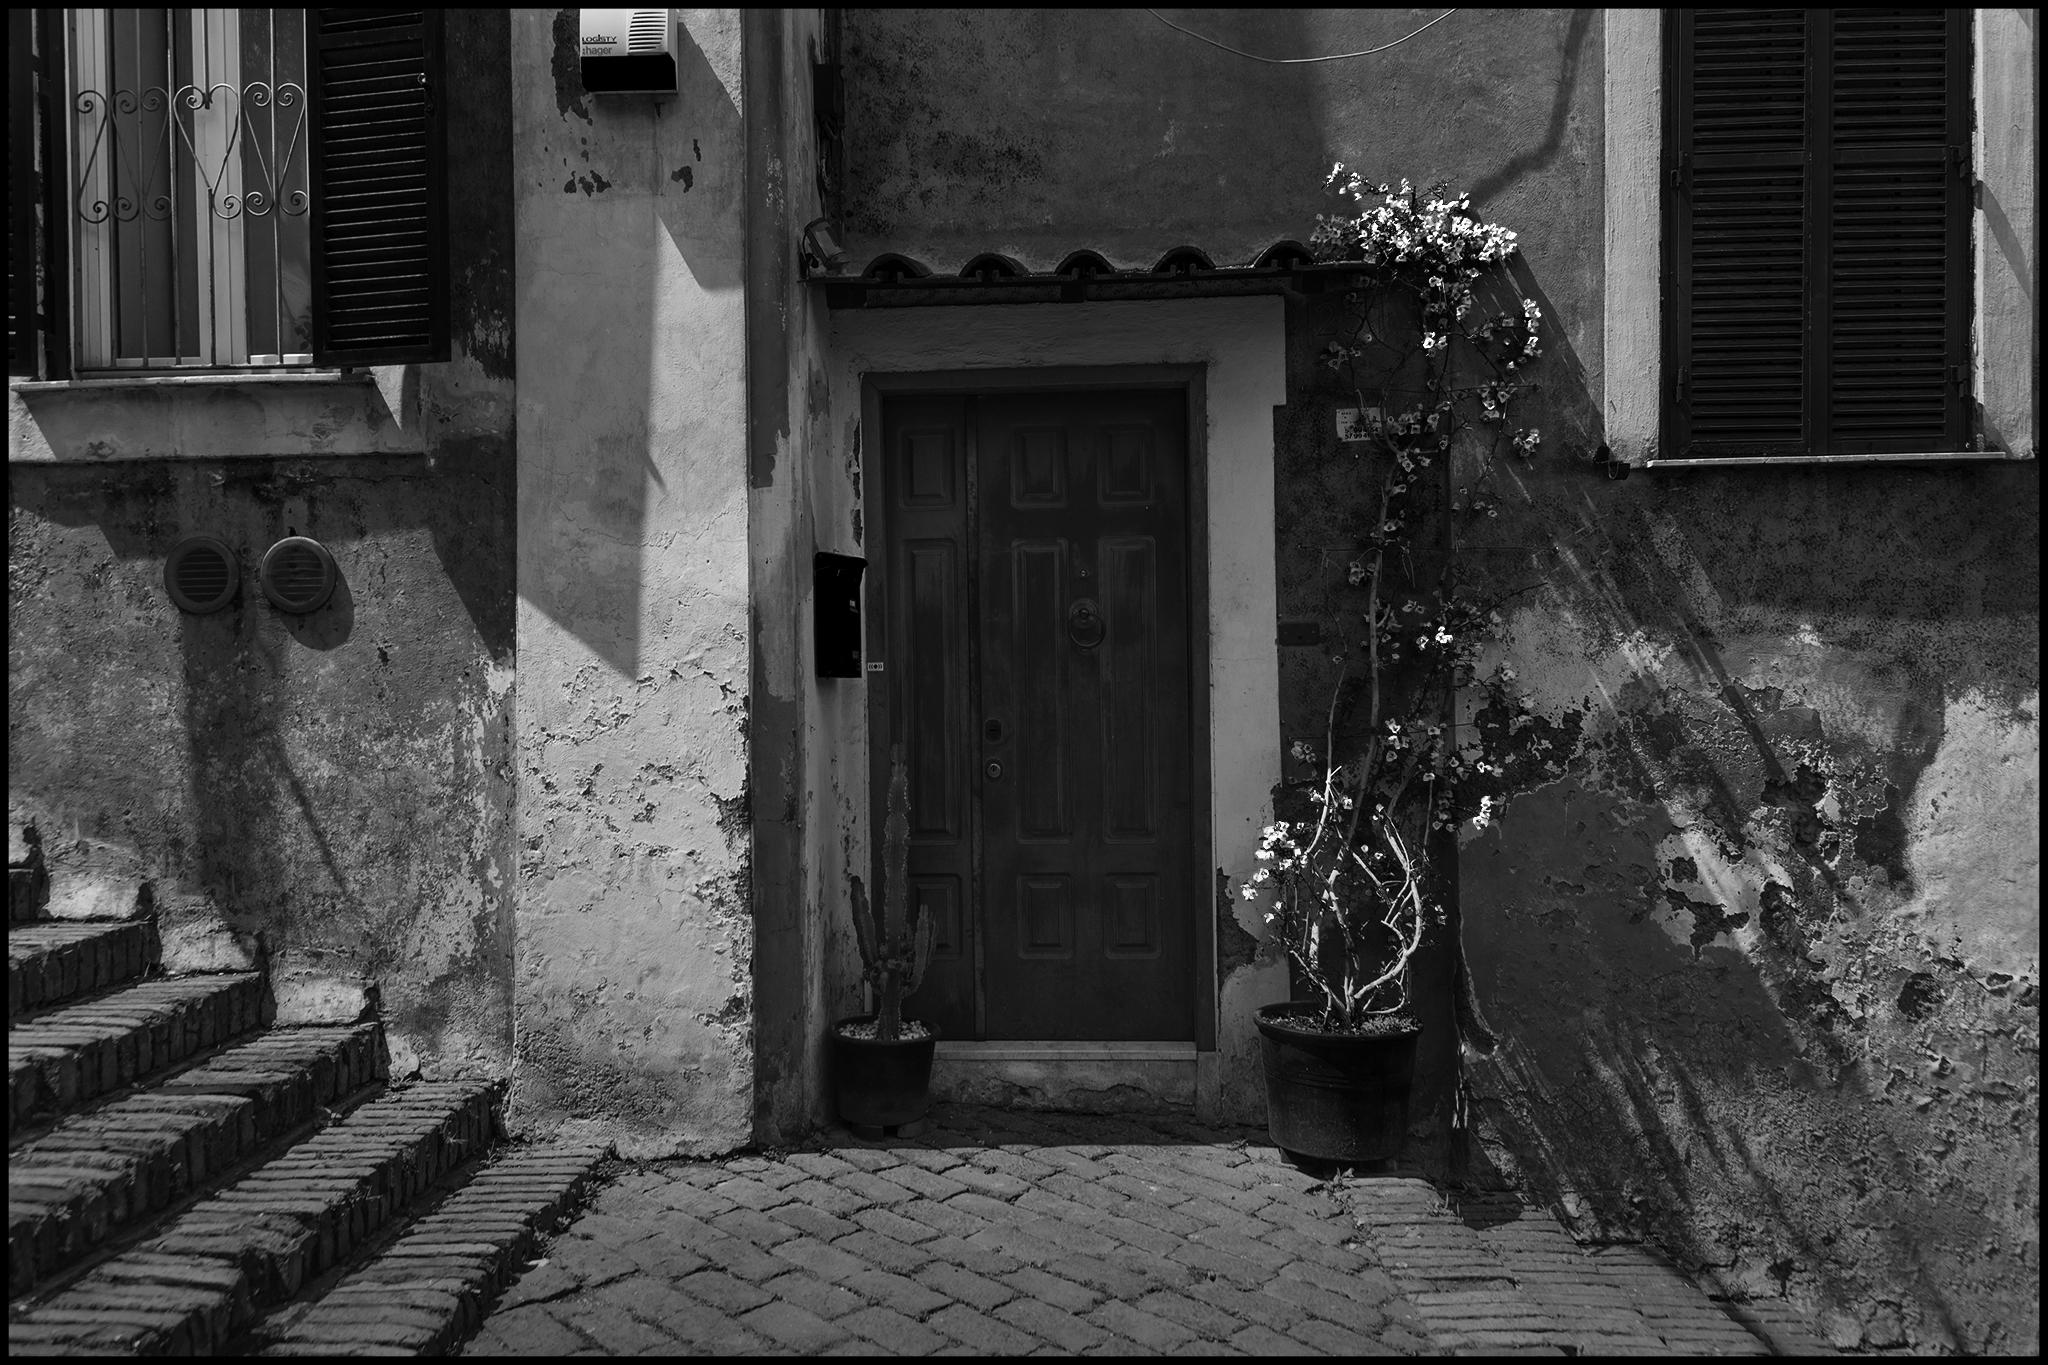 6 June 2019 - Door and stairs, Rome IT